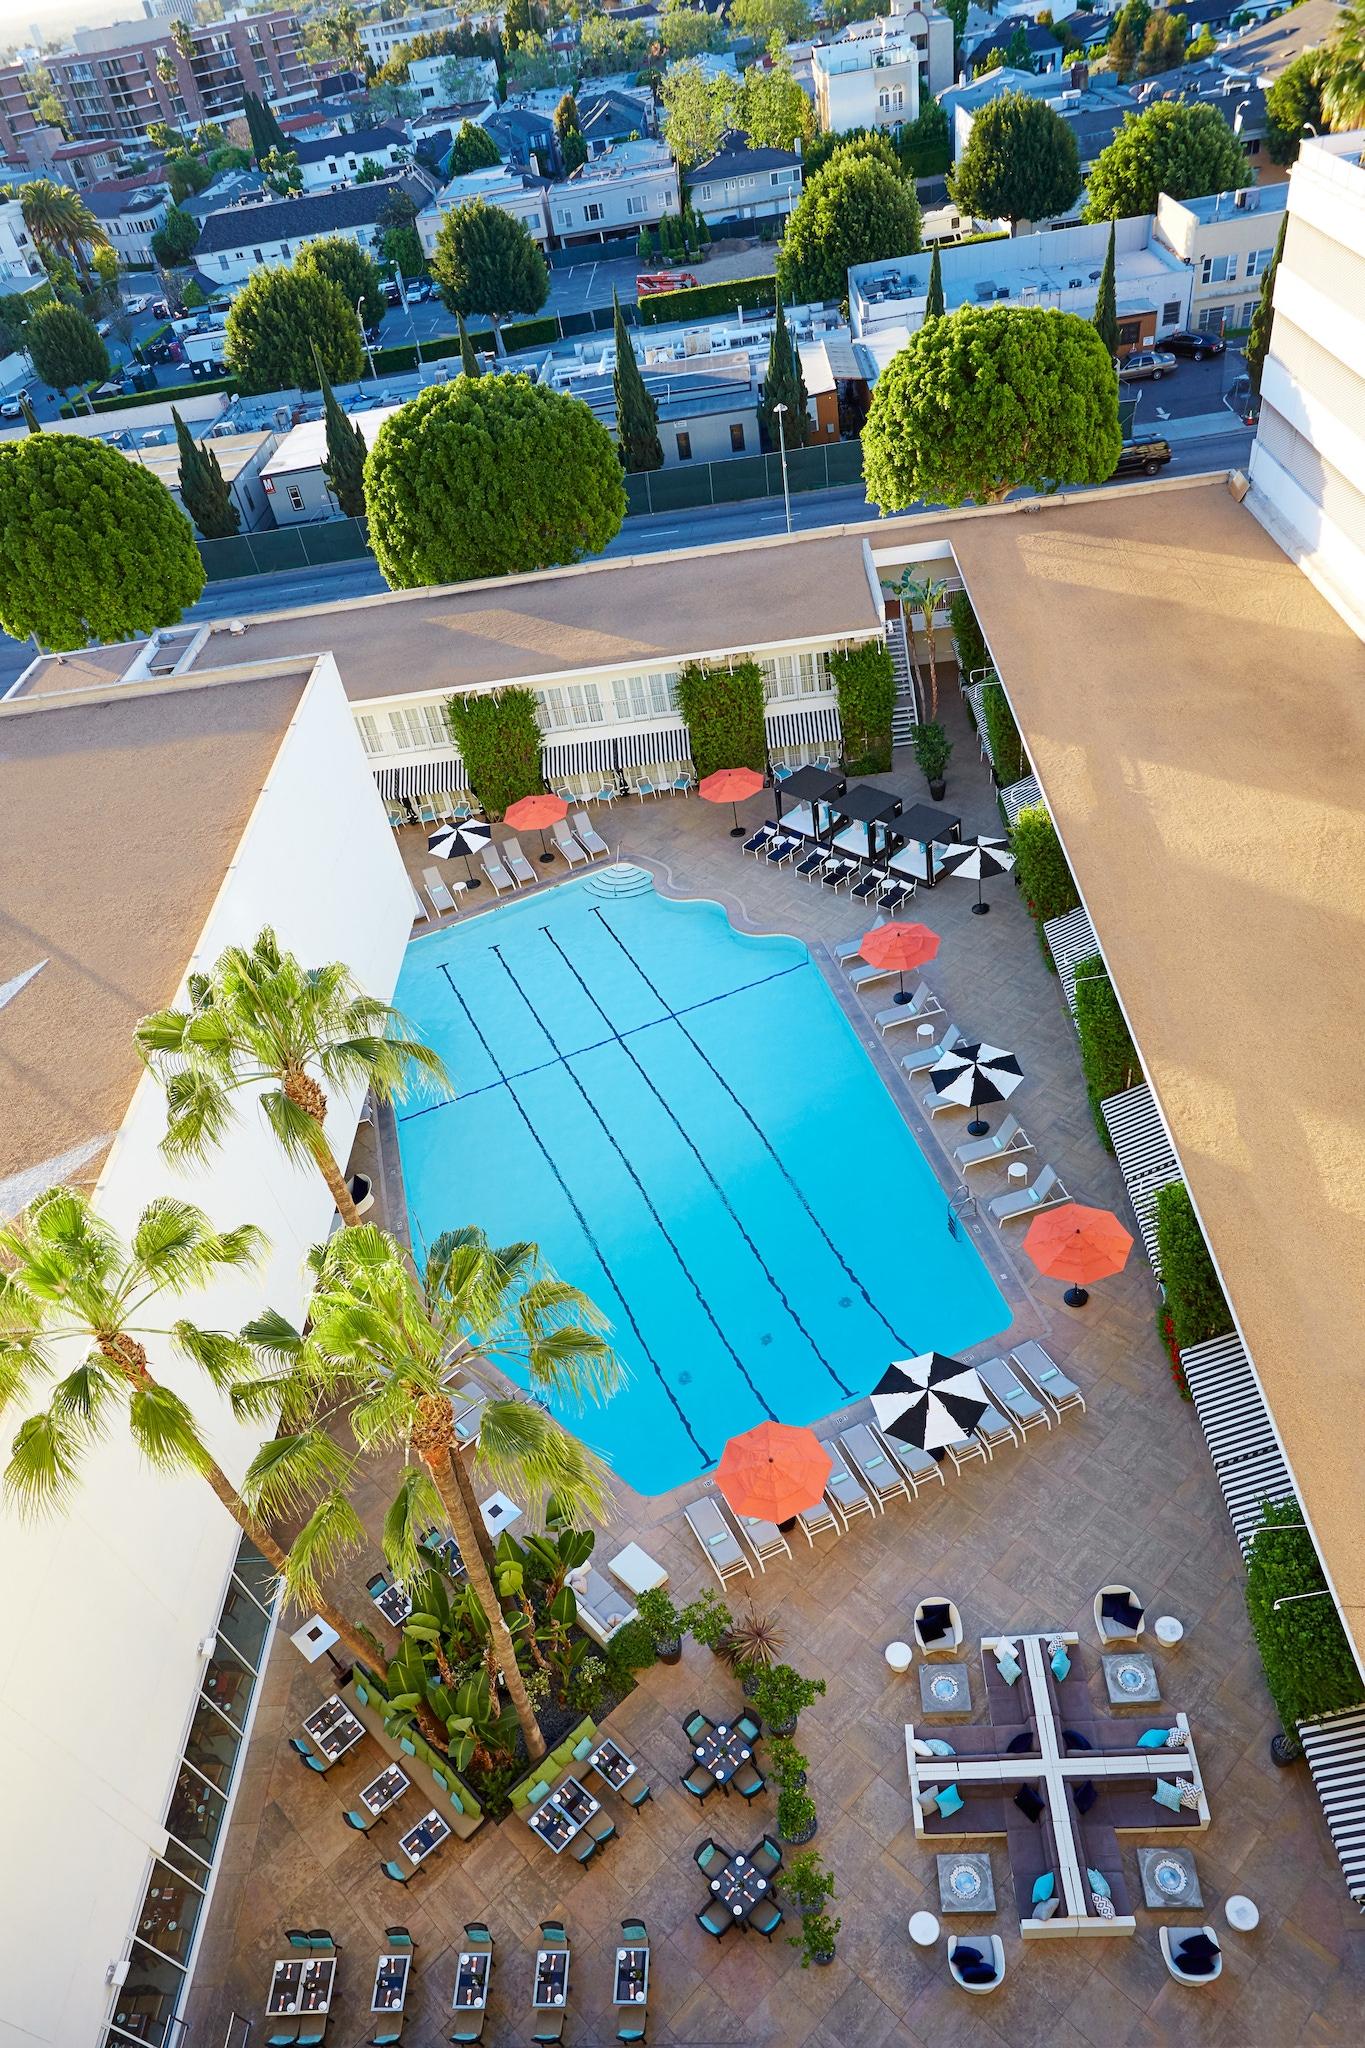 The Aqua Star Pool, The Beverly Hilton